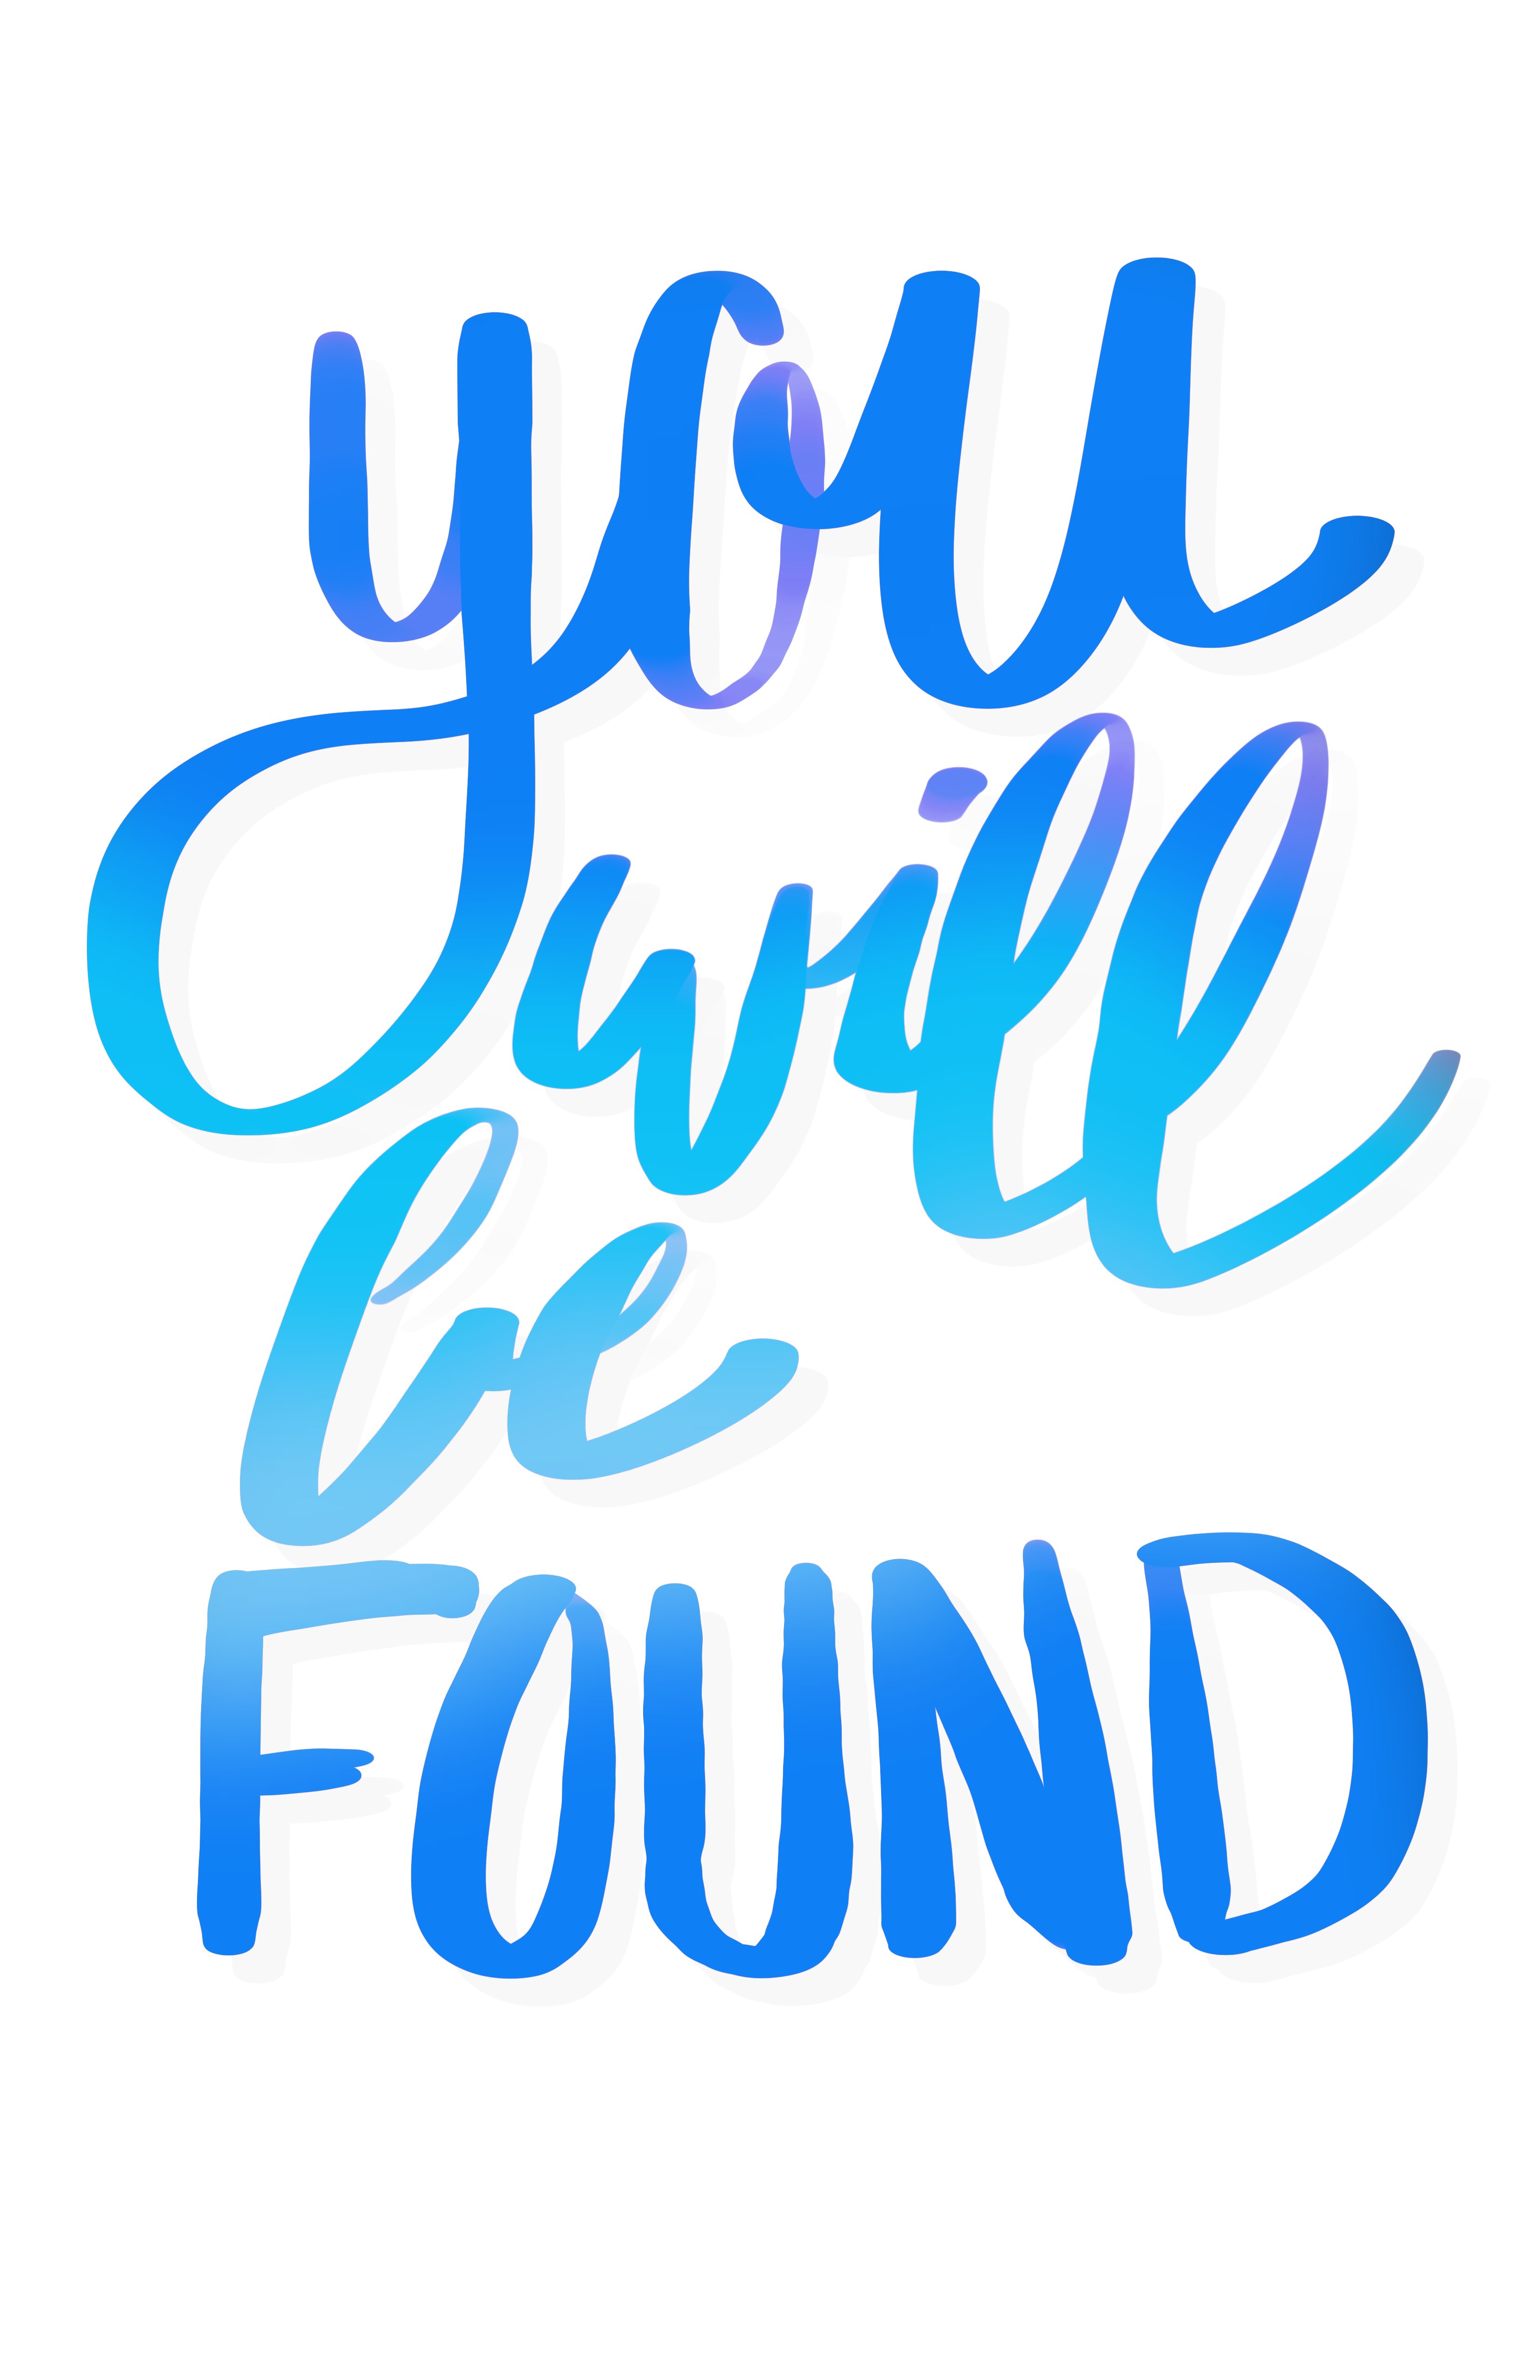 Dear Evan Hansen Quotes Wallpaper Quot Dear Evan Hansen Quot Lyric Quot You Will Be Found Quot Skillshare